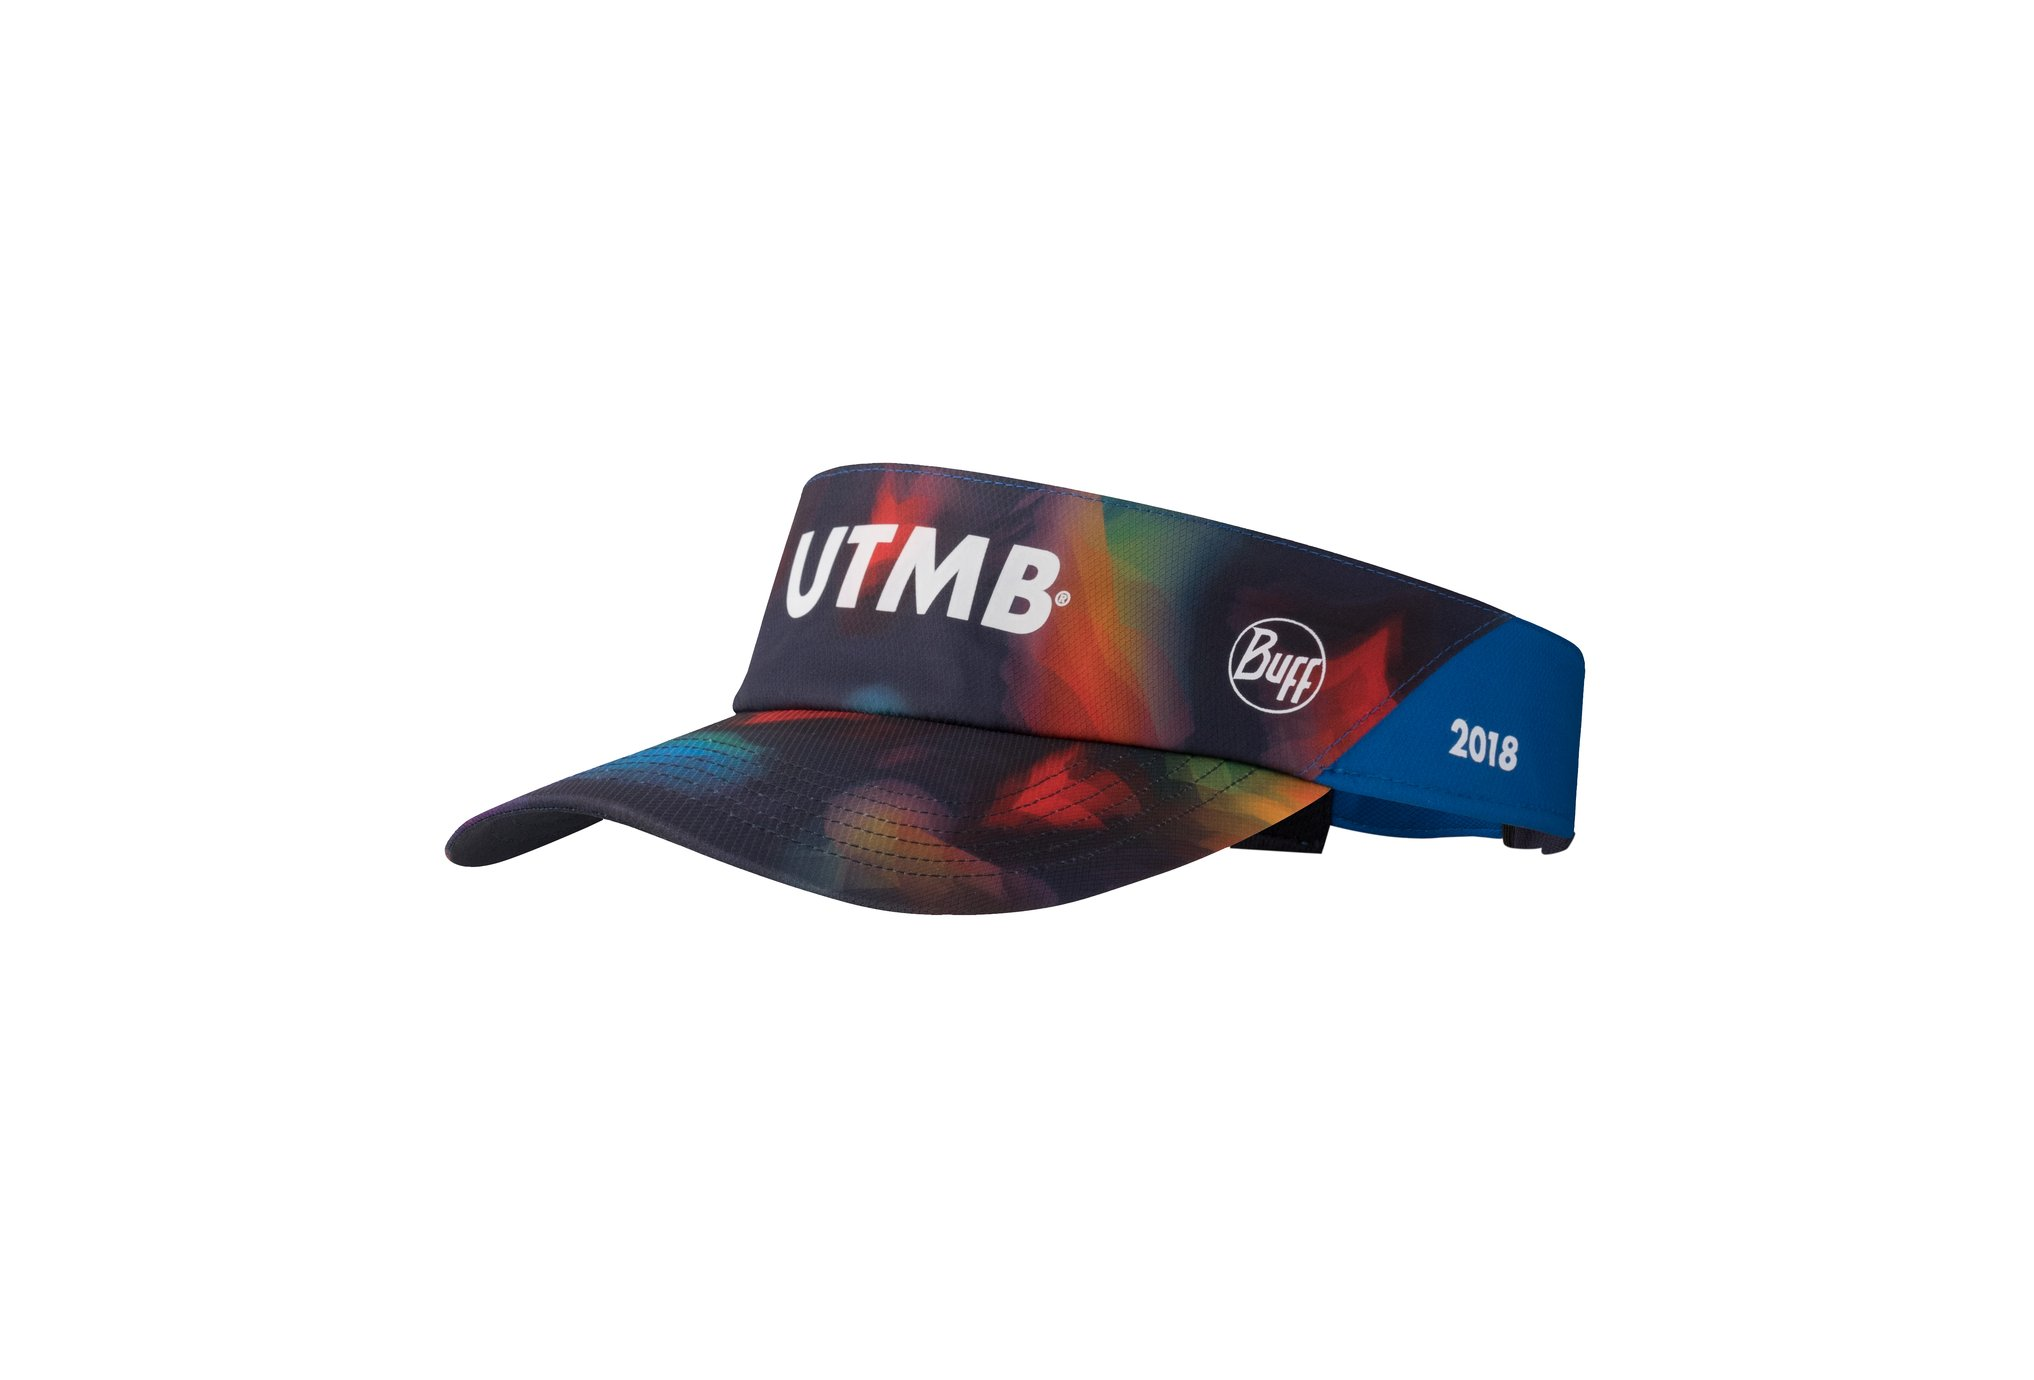 Buff Visor UTMB®2018 Casquettes / bandeaux